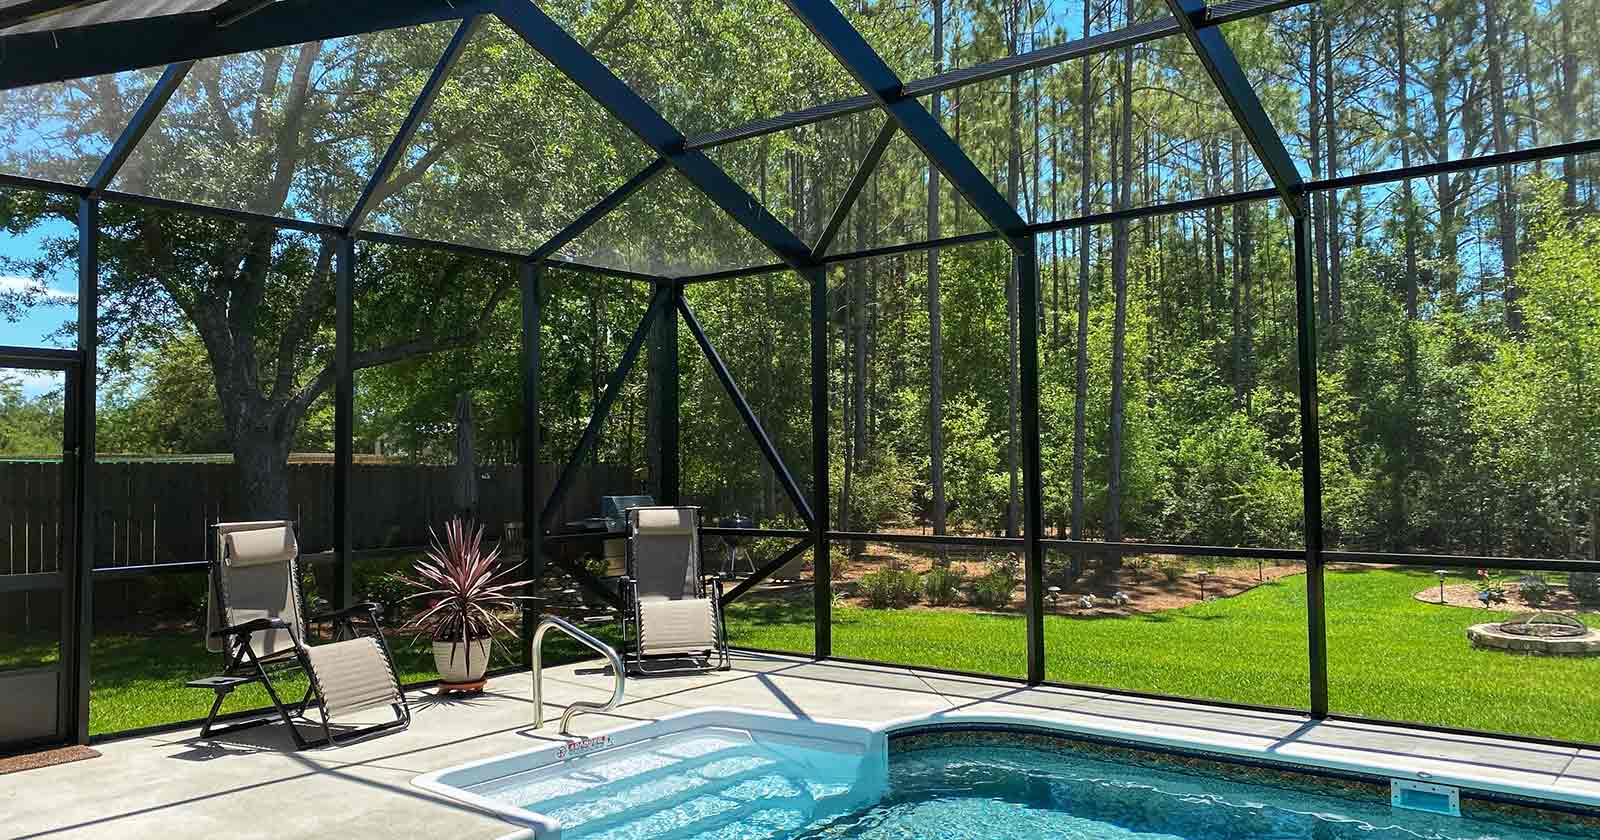 5 benefits installing pool enclosure